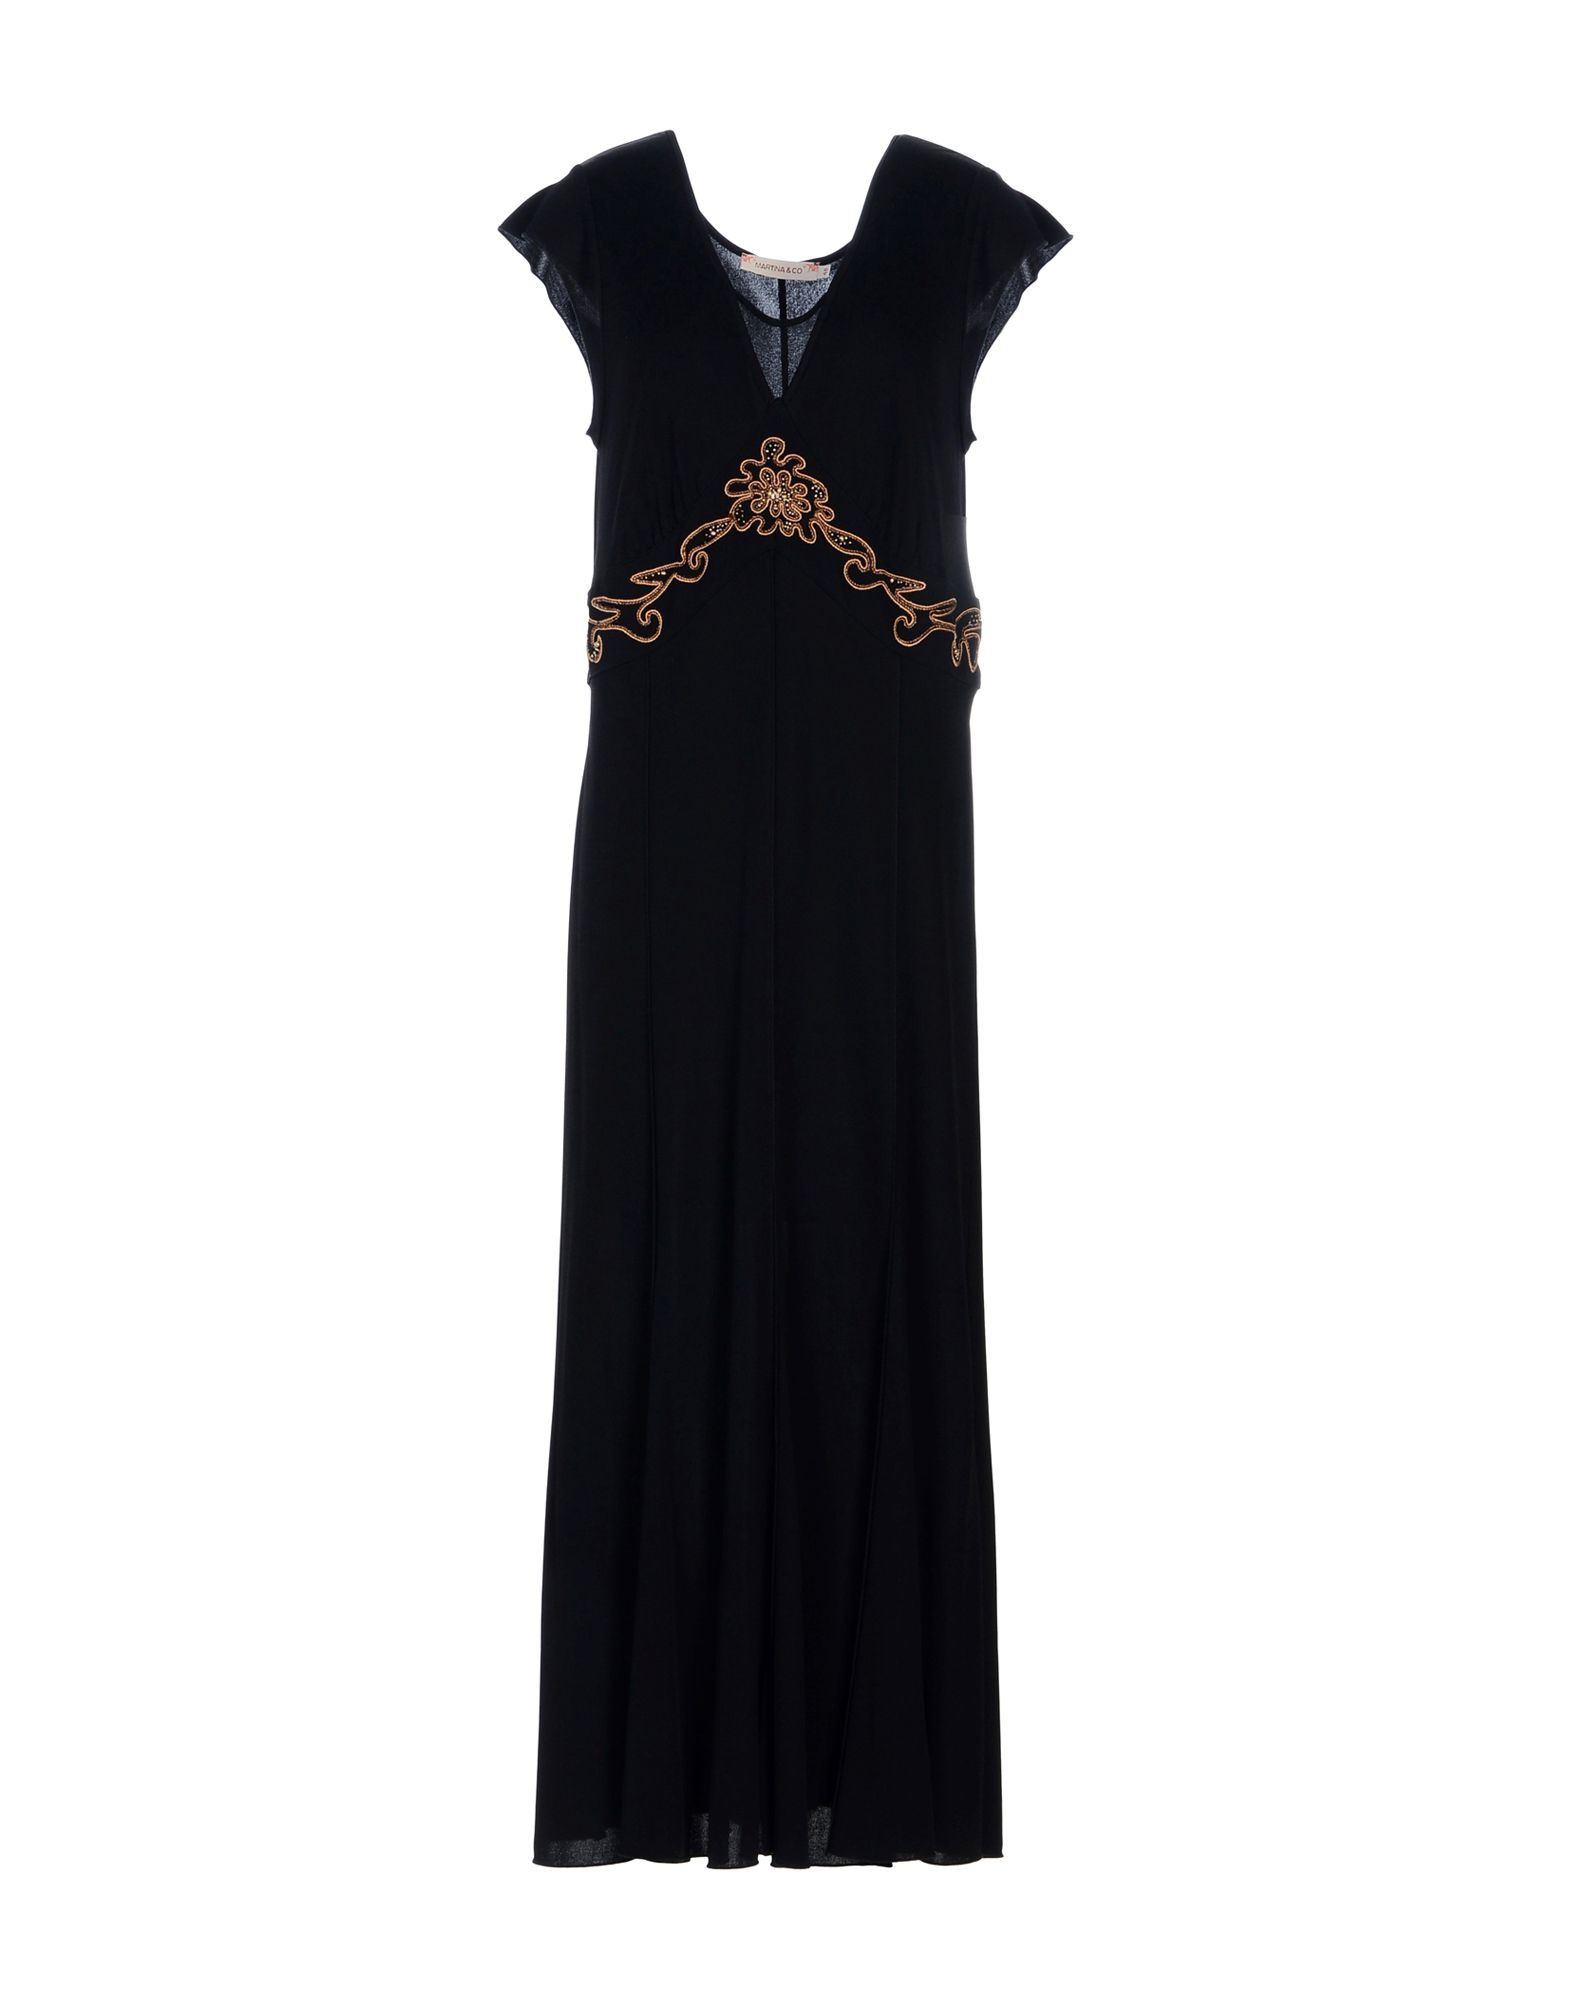 MARTINA & CO Платье длиной 3/4 la martina gmp607xc007 07088